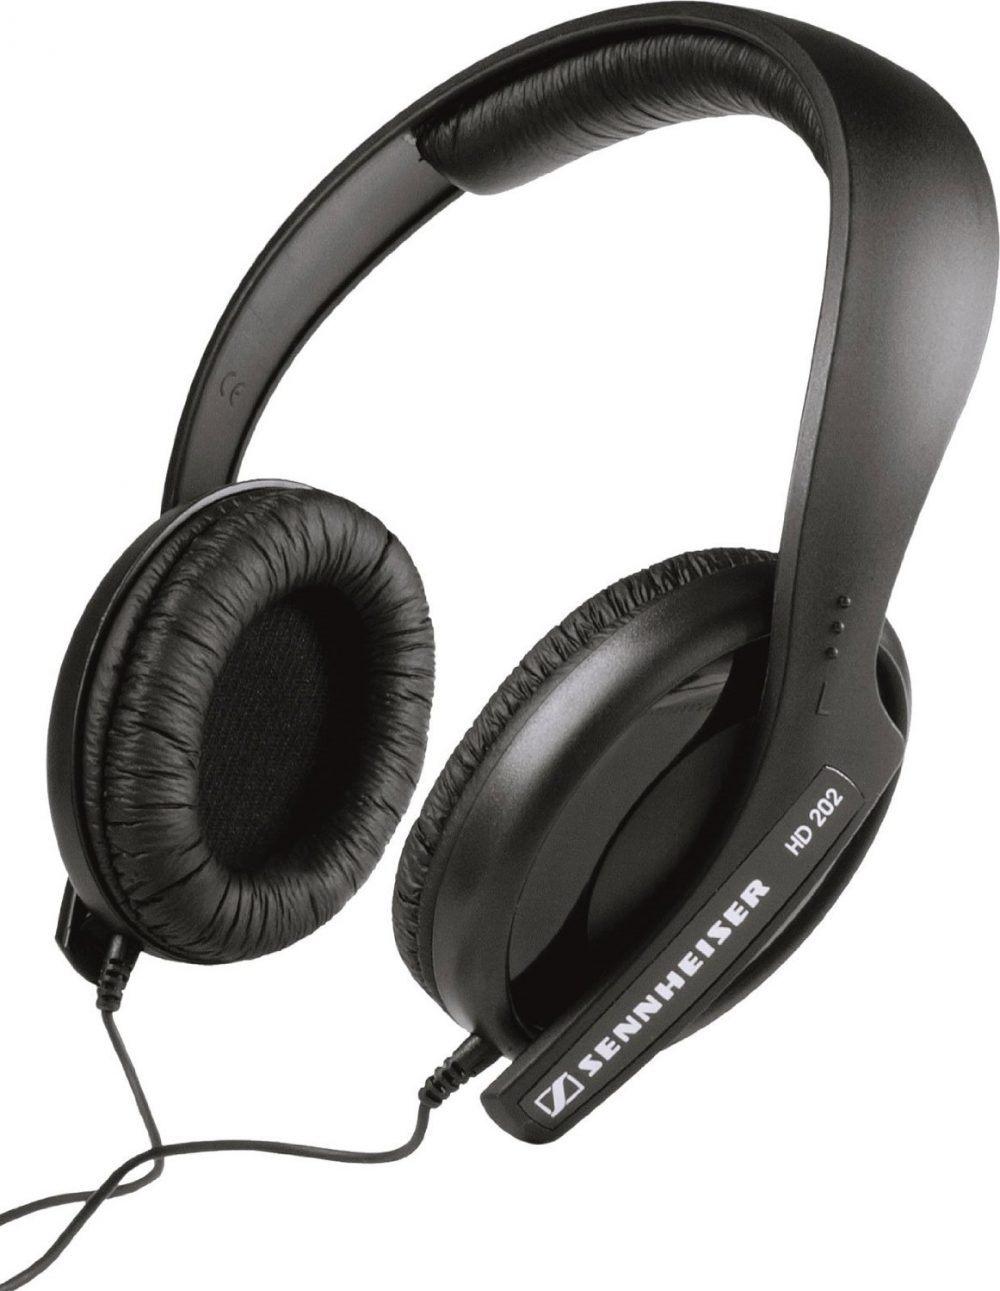 Amazon, https://www.amazon.com/Sennheiser-202-Professional-Headphones-Black/dp/B003LPTAYI